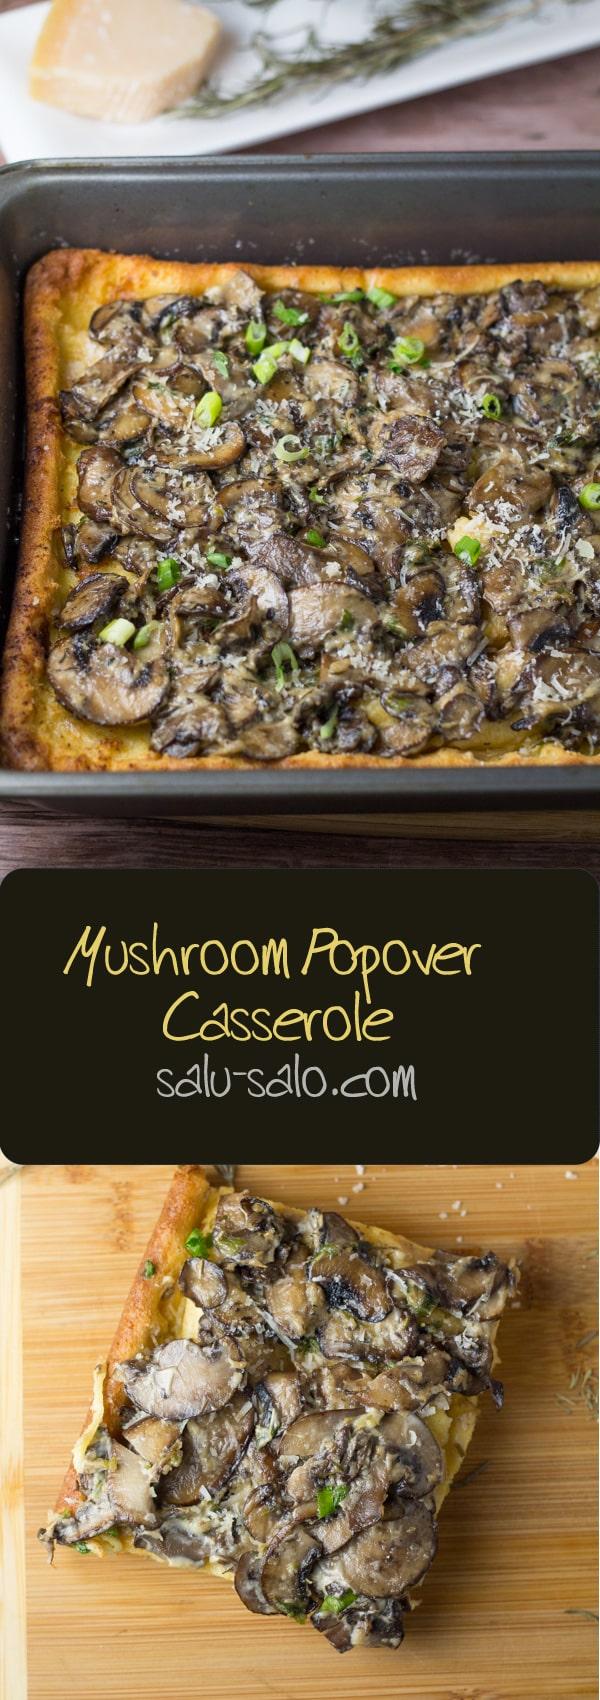 Mushroom Popover Casserole